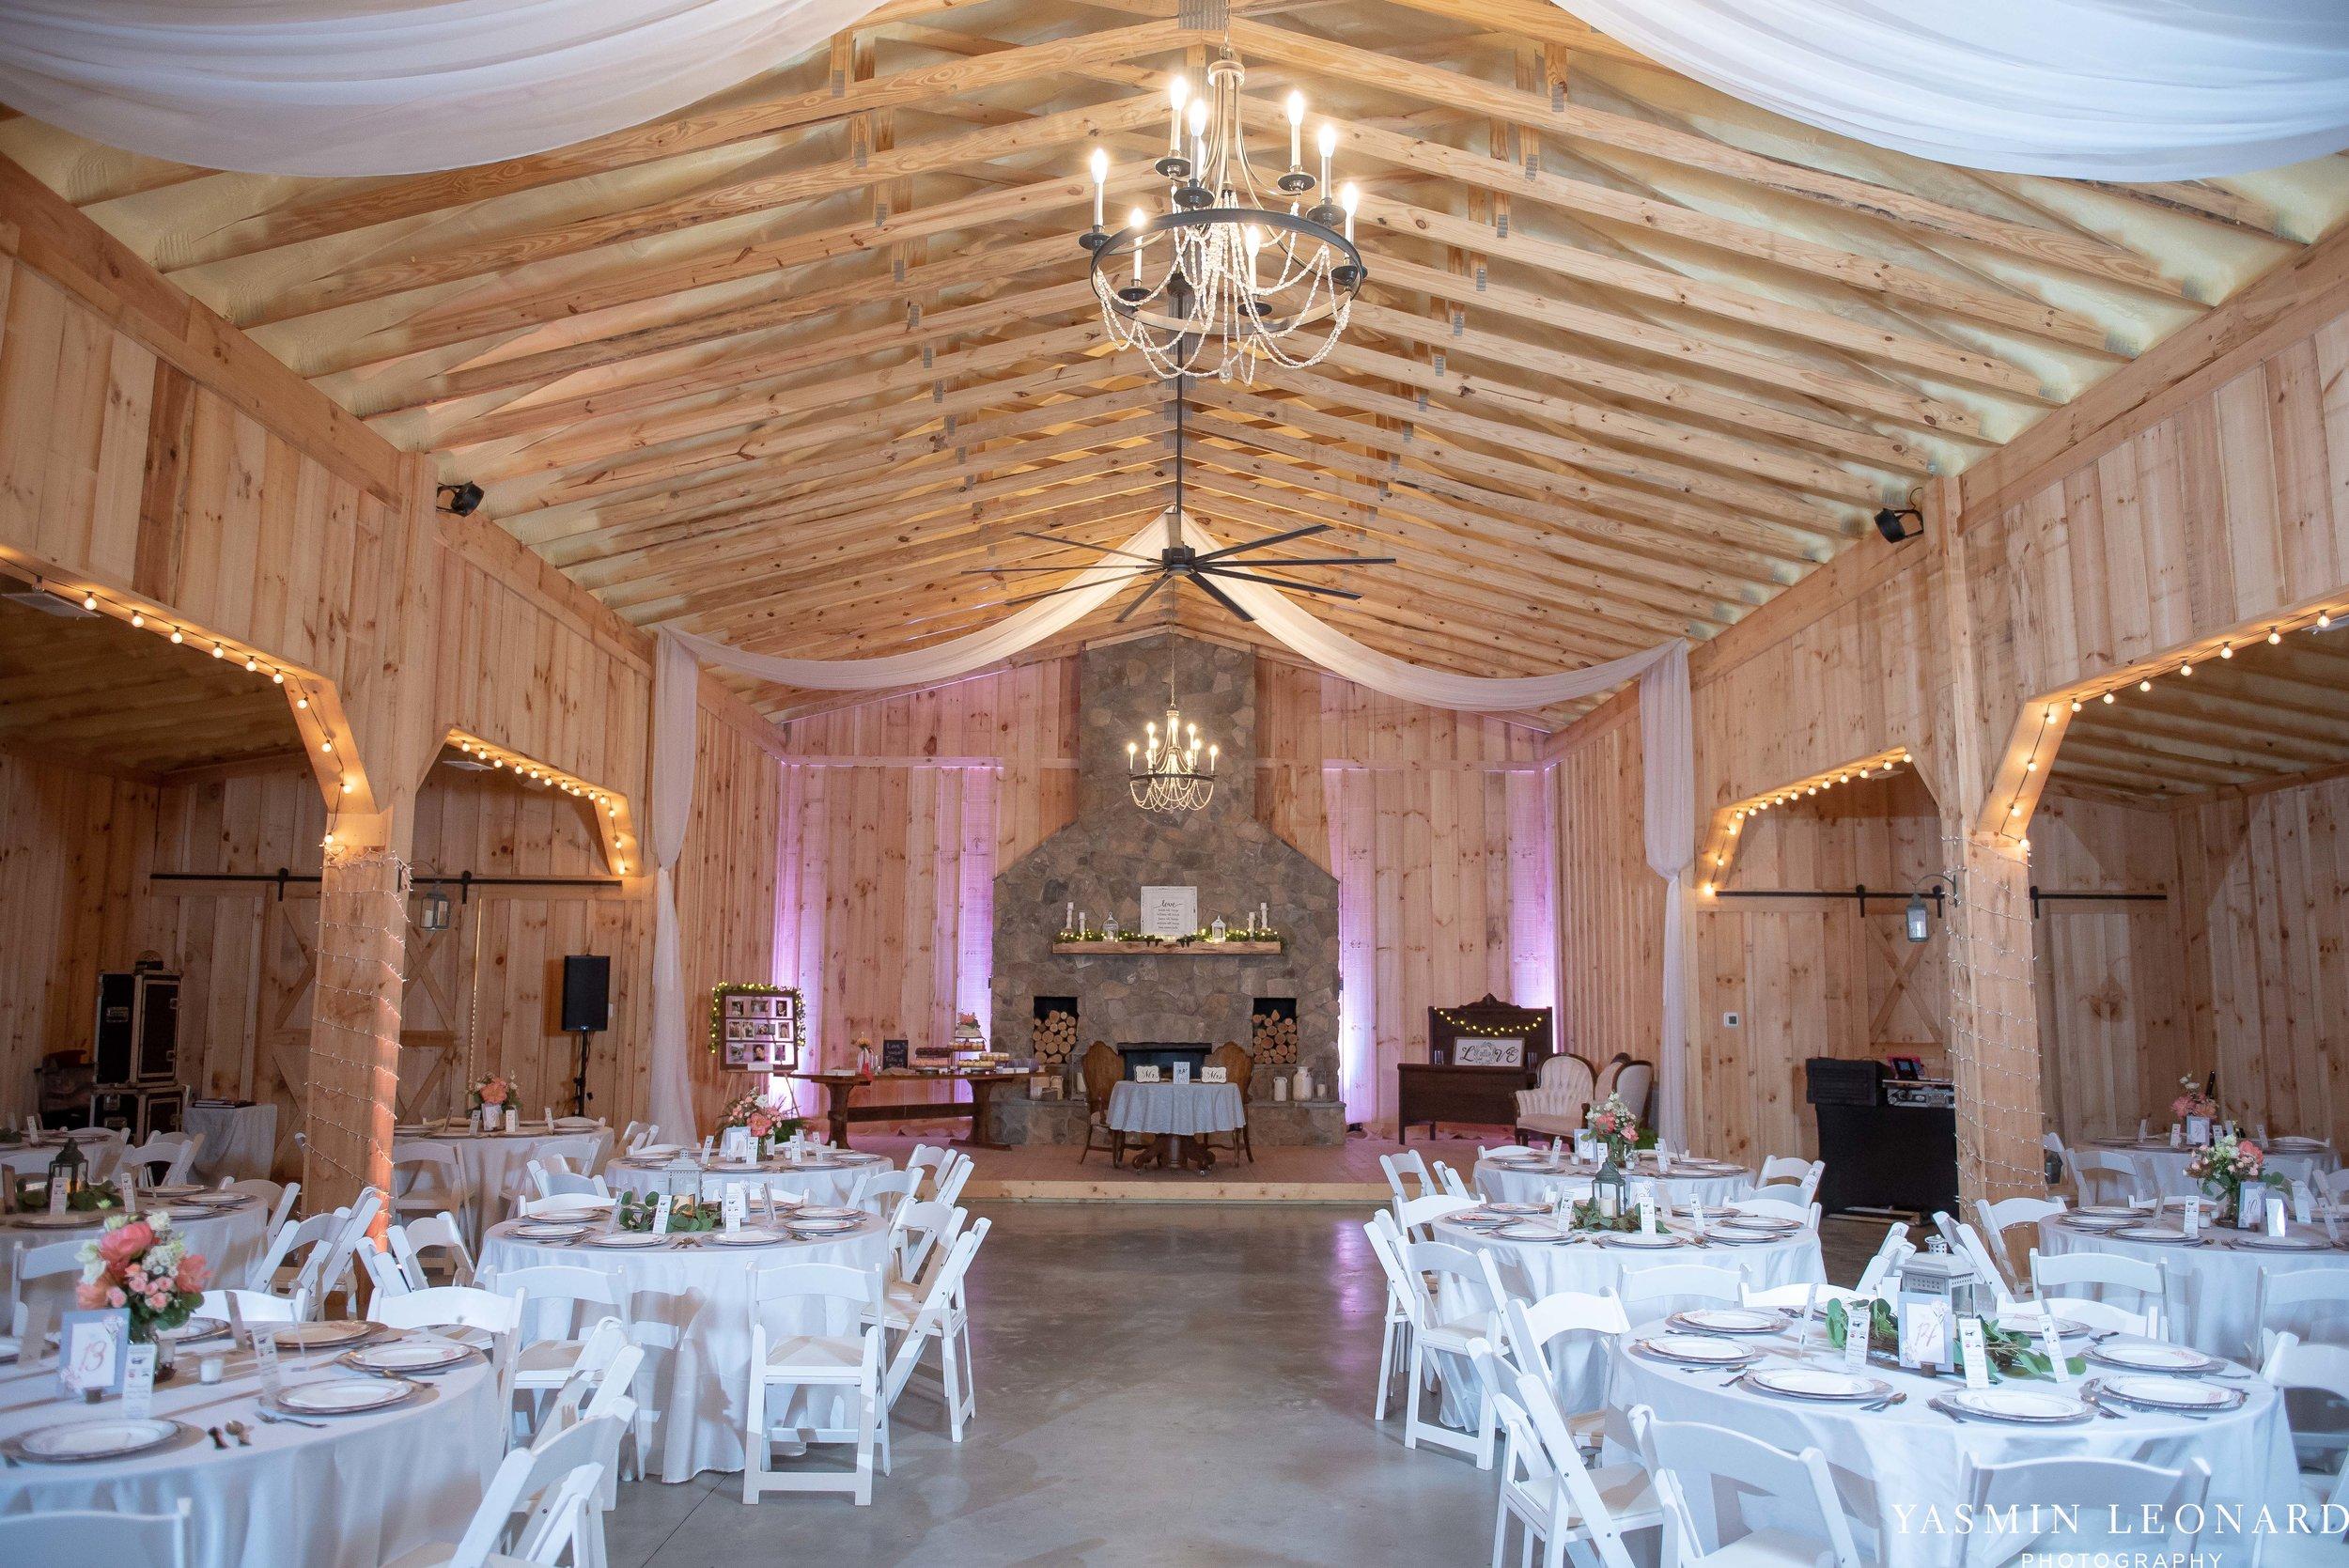 Old Homeplace Vineyard - NC Weddings - Outdoor Summer Weddings - Peony Boutique - Vineyard Wedding - NC Photographer - Yasmin Leonard Photography-8.jpg